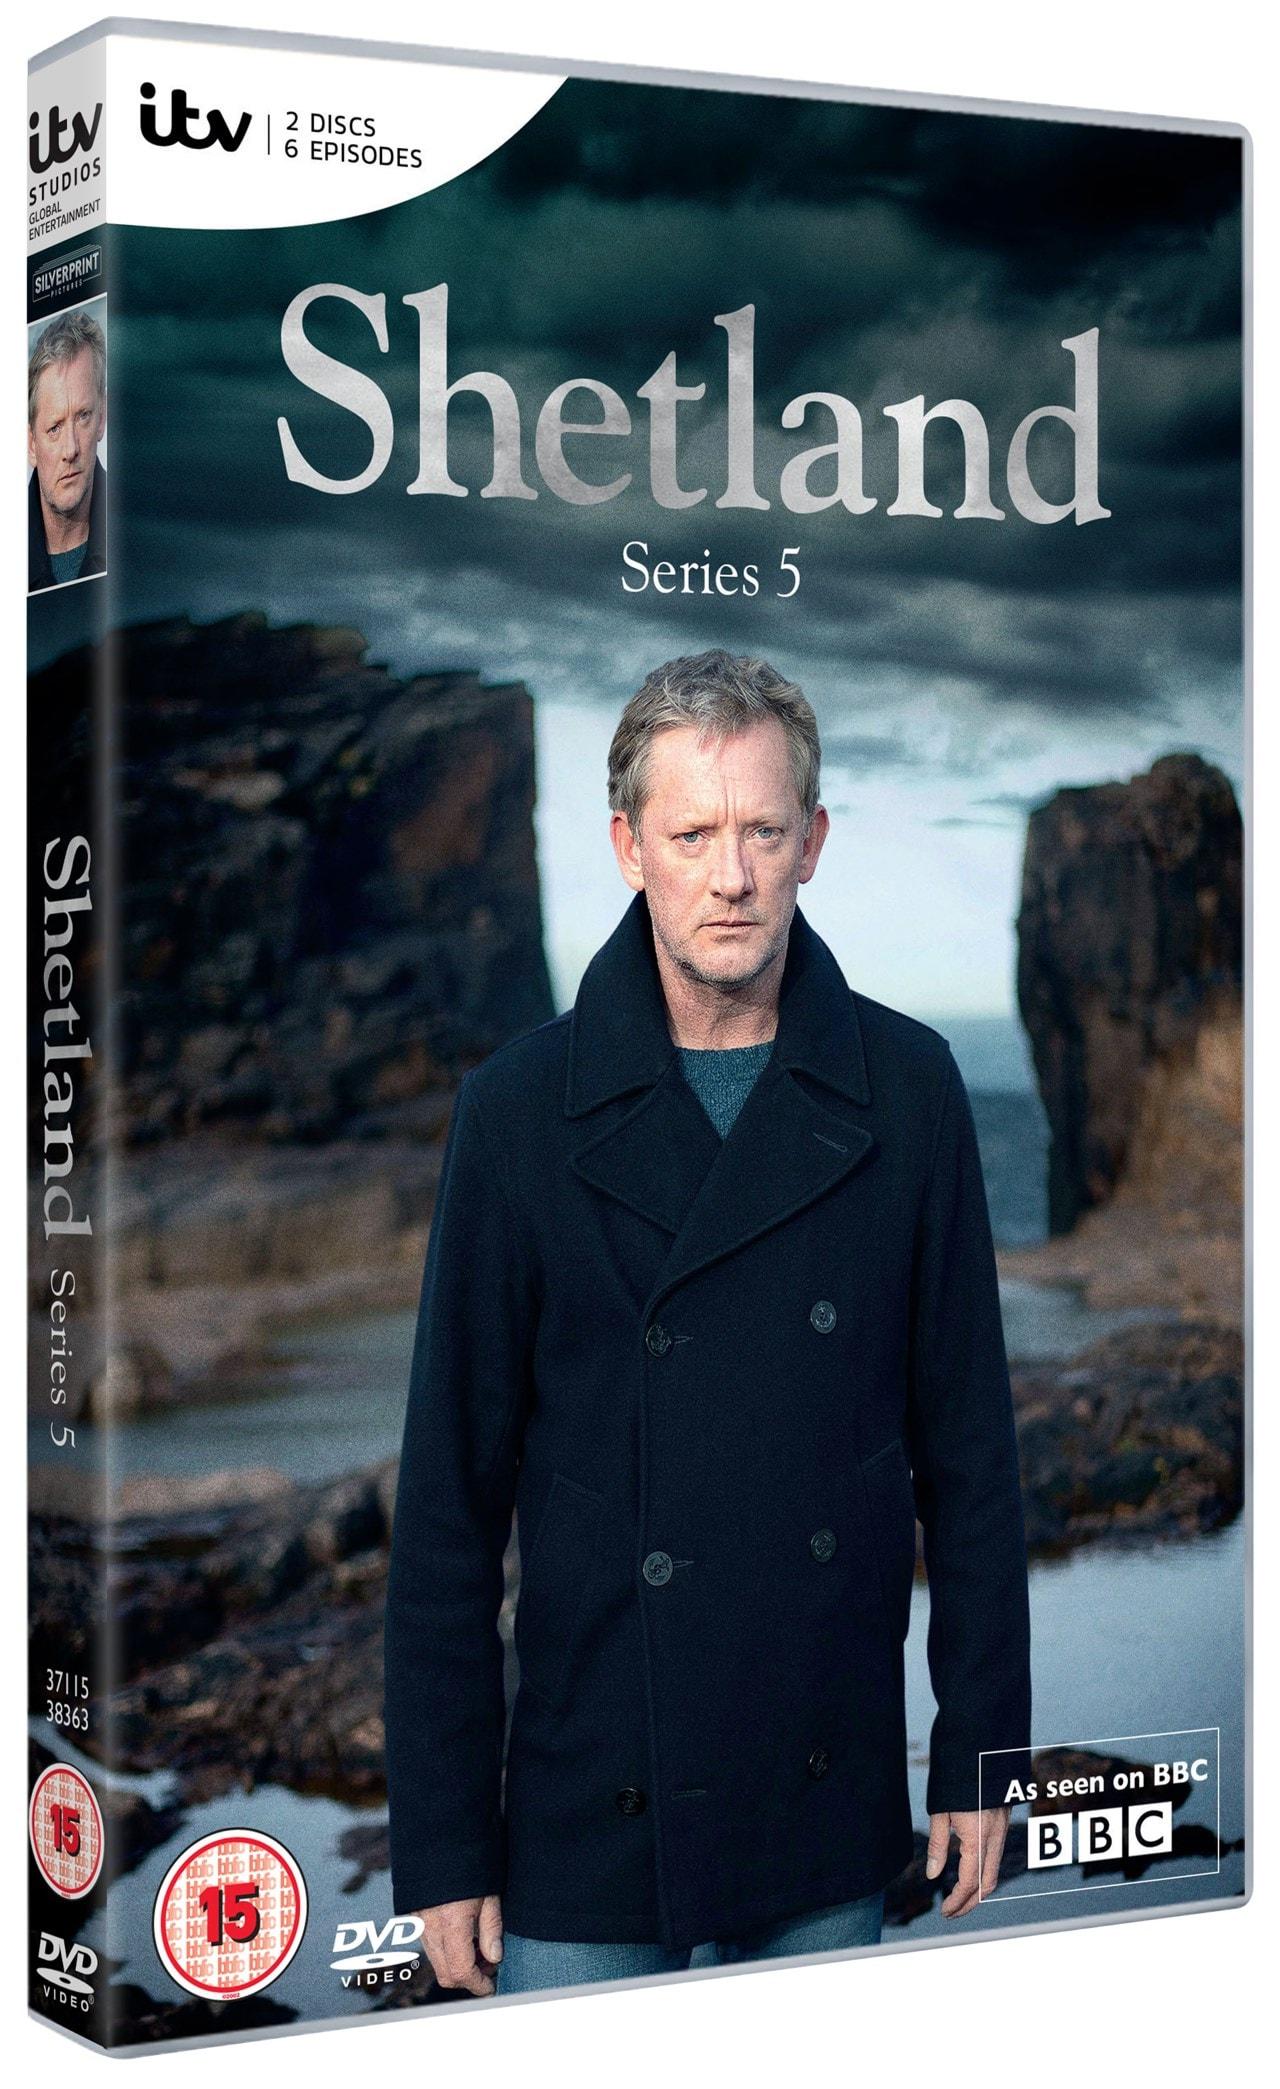 Shetland: Series 5 - 2